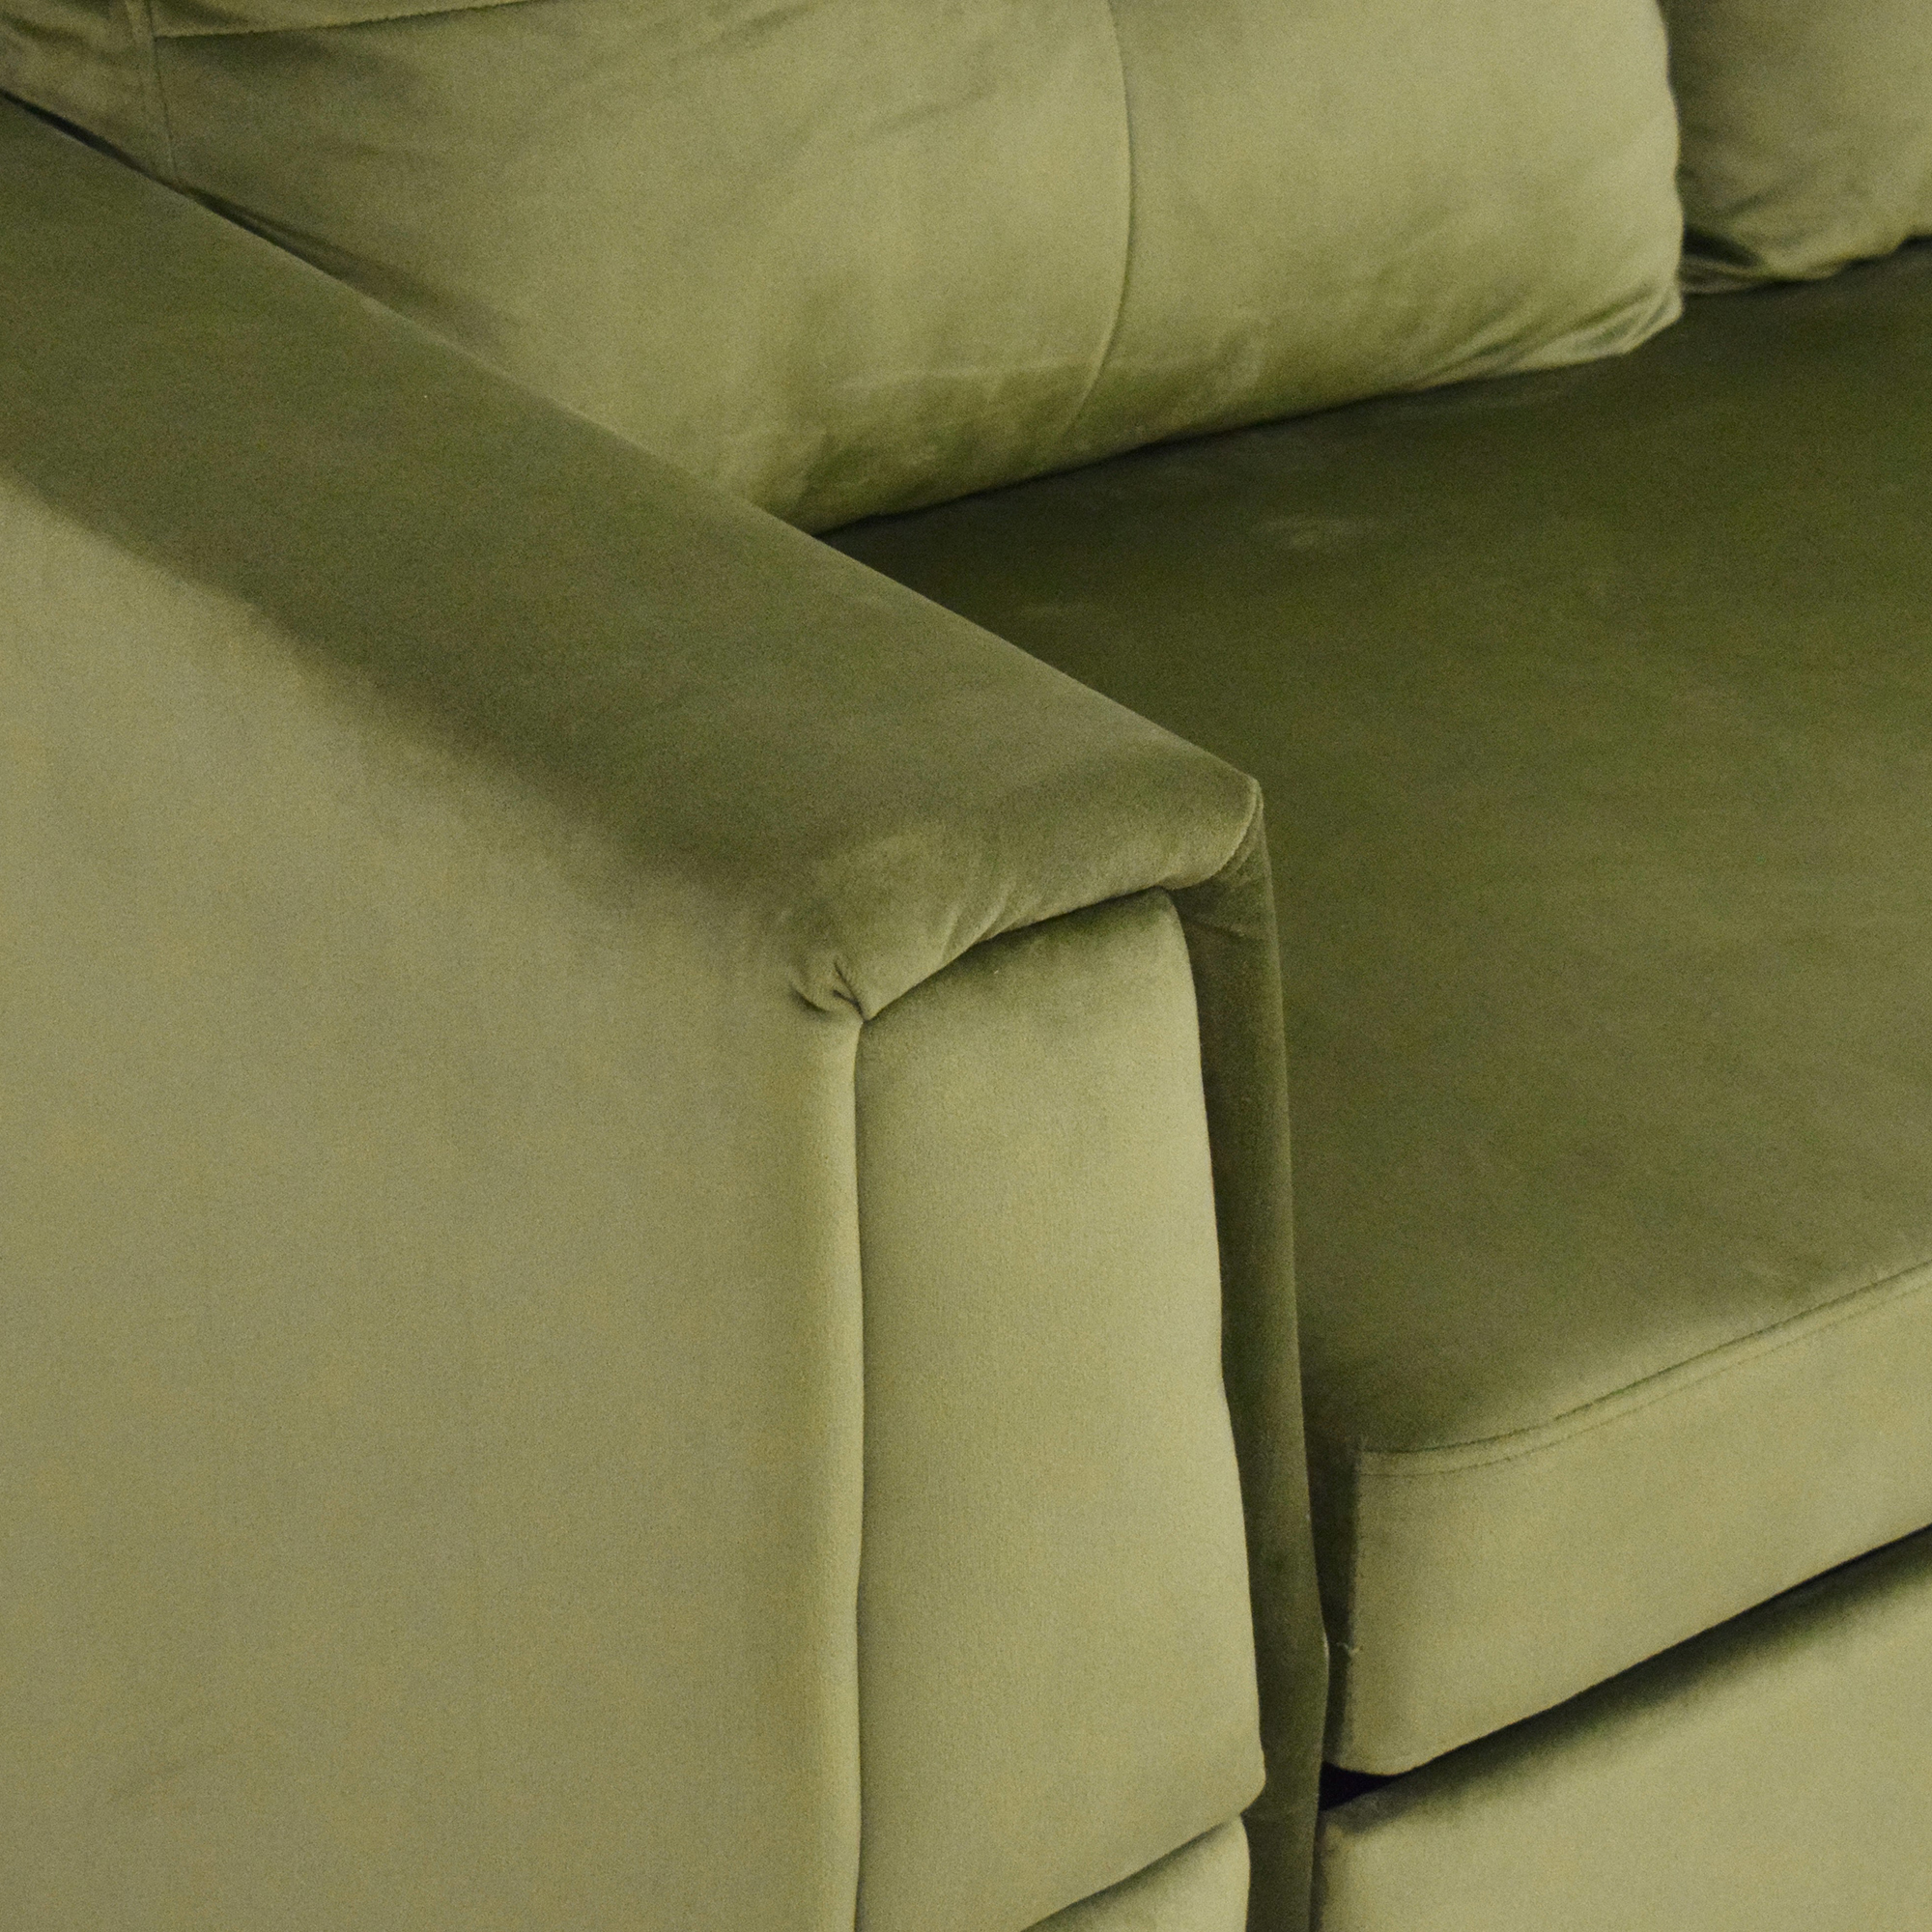 shop Wayfair Mercer41 Nelda Round Arm Sleeper Sofa Wayfair